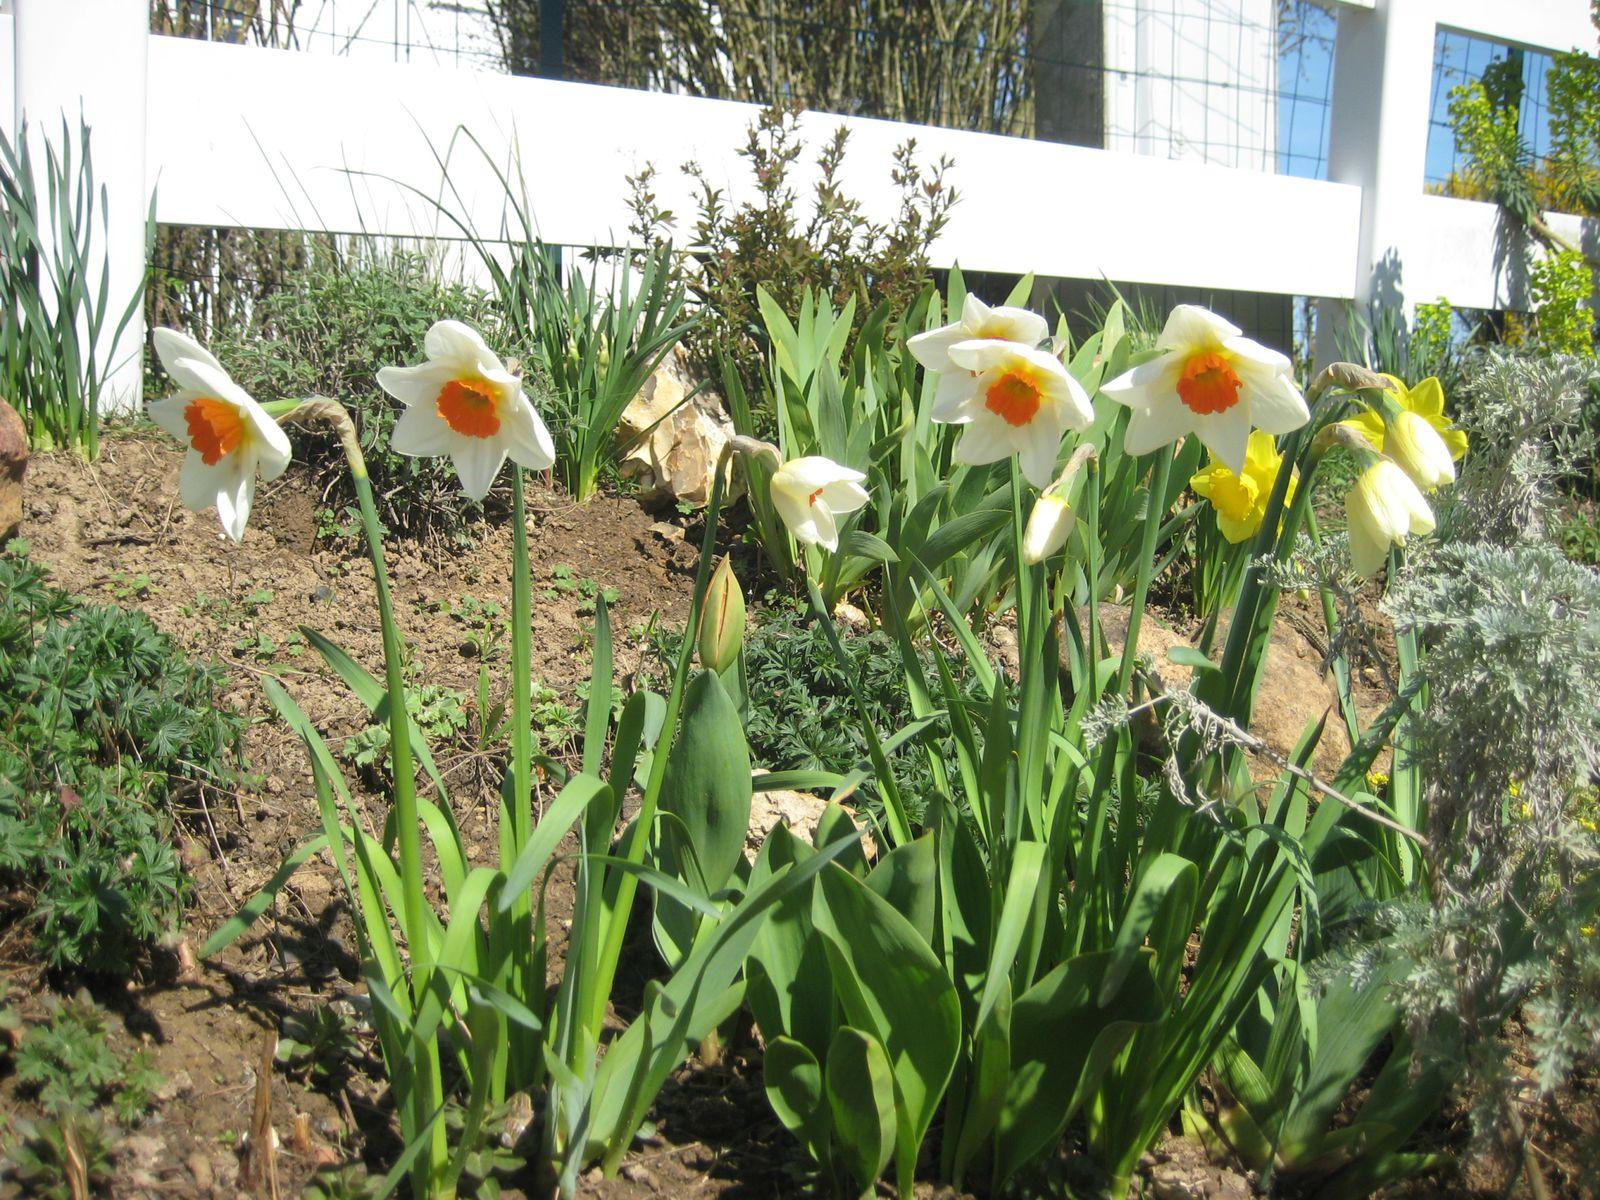 Narcisses, Jonquilles et Tulipes